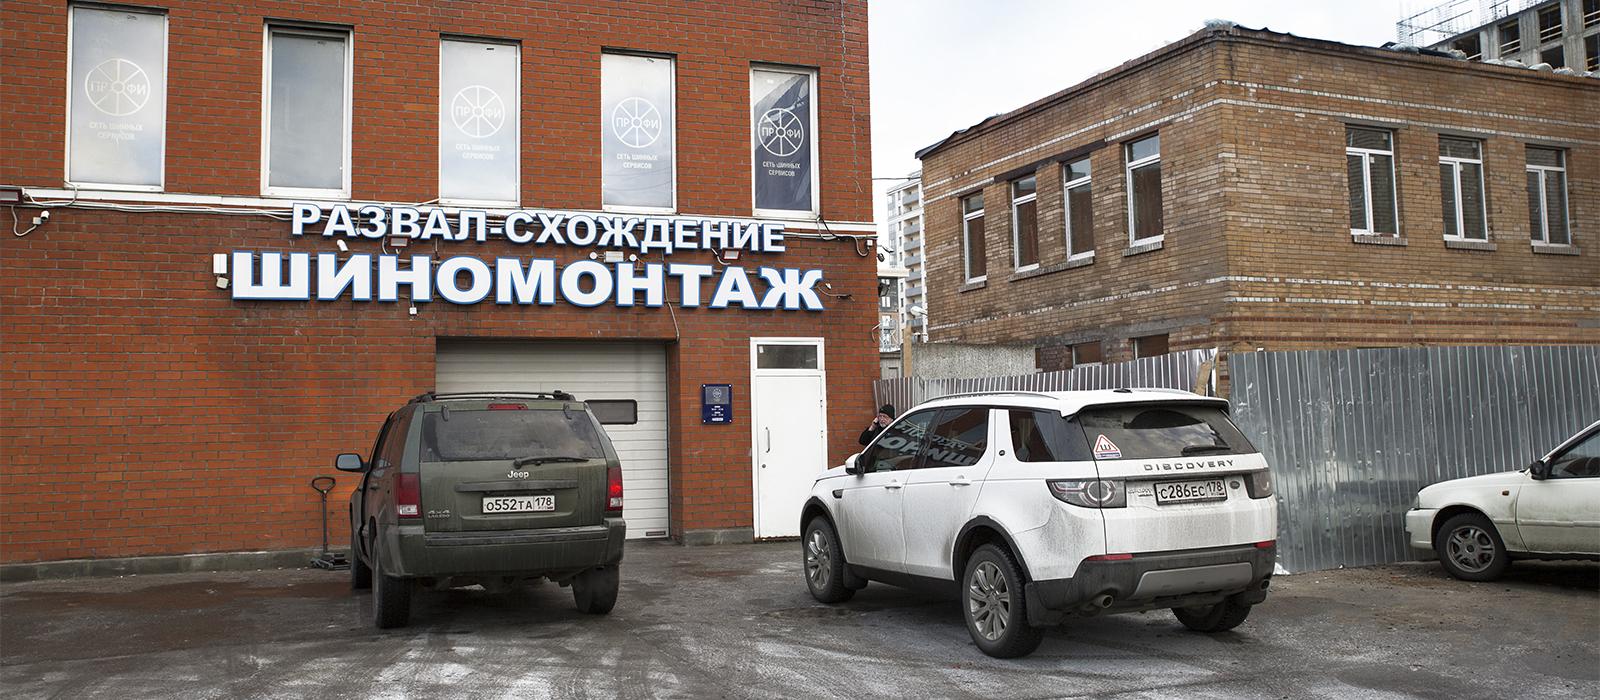 Шиномонтаж на Васильевском